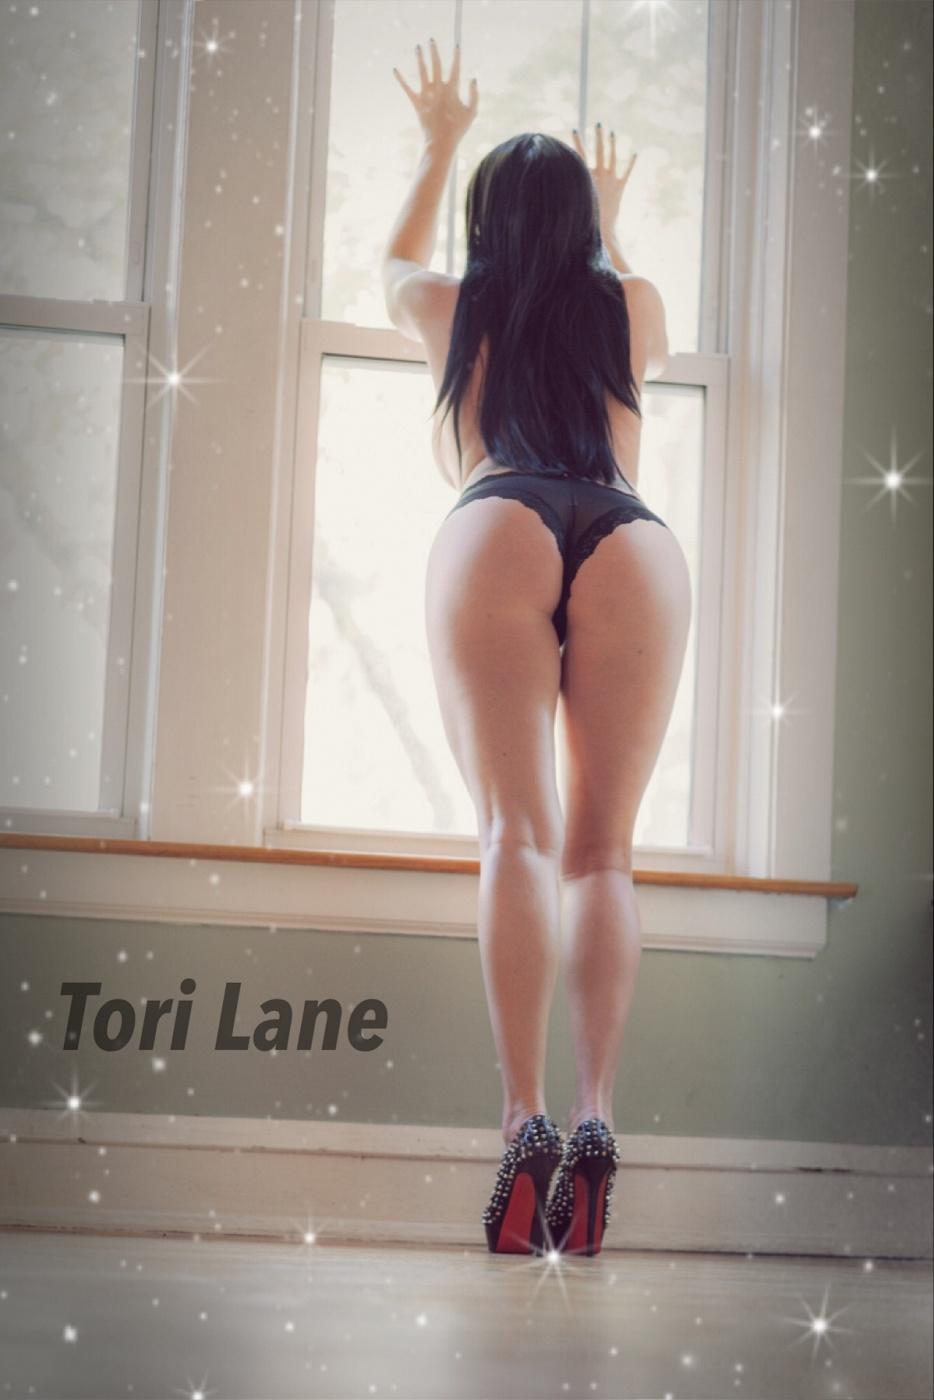 Victoria Lane